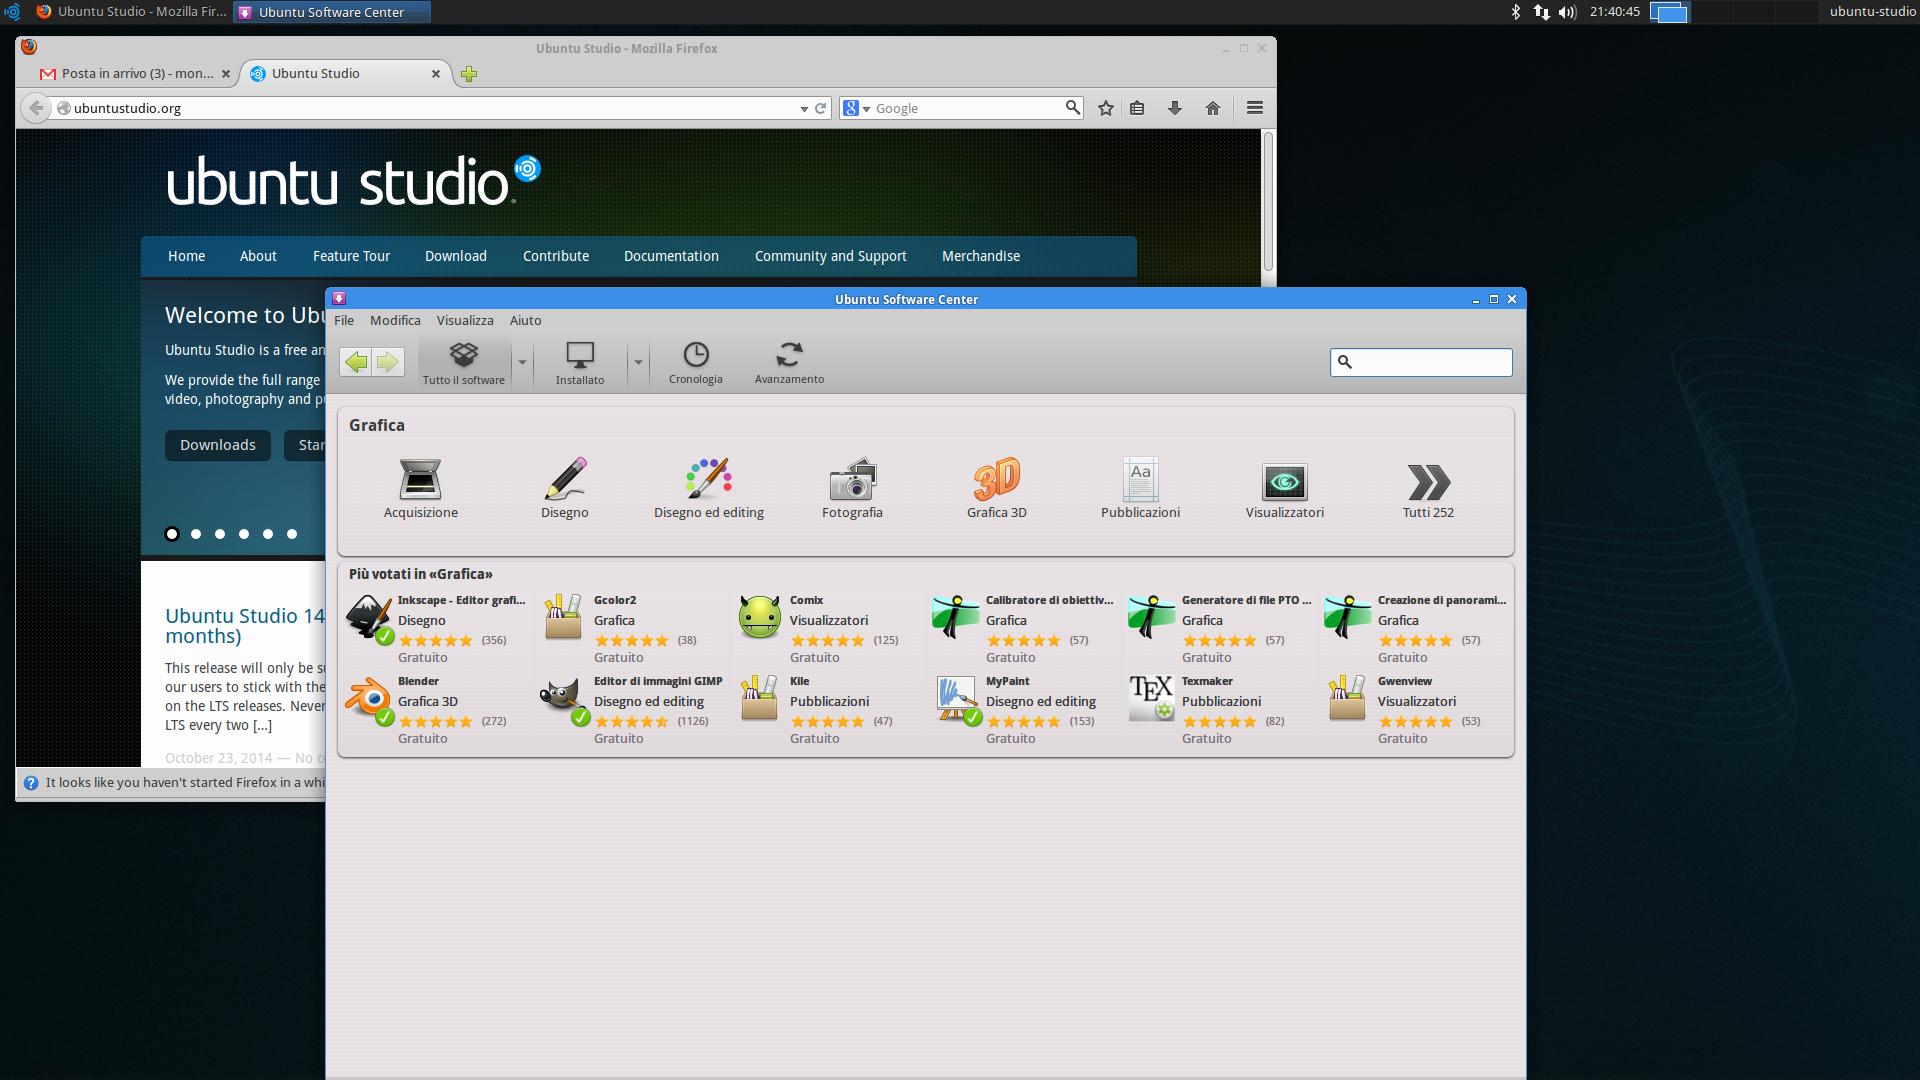 sites/default/files/scopri-ubuntu/ubuntustudio/soft-studio.png